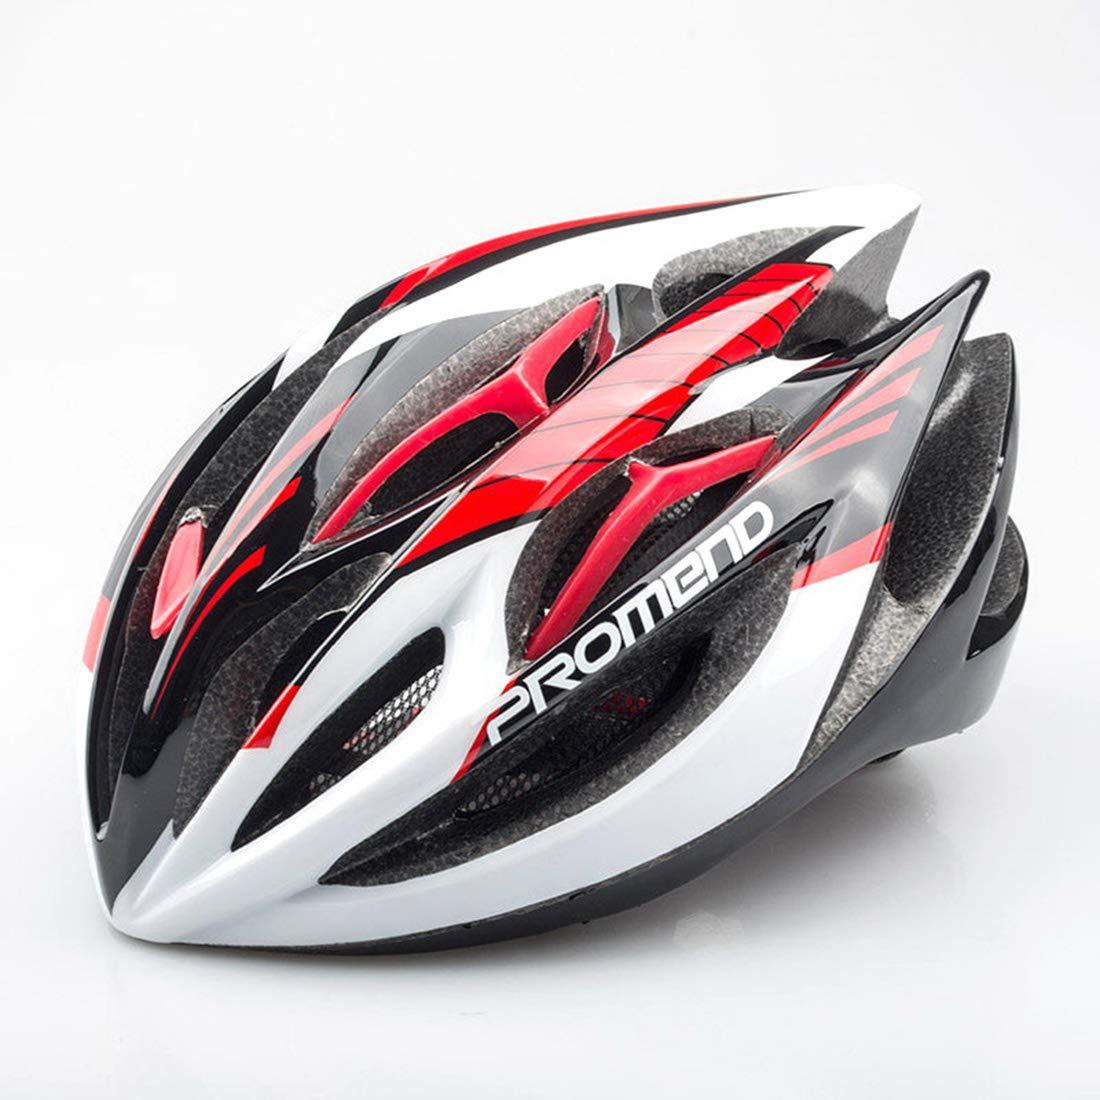 CAFUTY 屋外サイクリング愛好家に適した自転車乗りヘルメット自転車安全ヘルメット大人の自転車ヘルメット (Color : A4)  A4 B07PLH5BVL